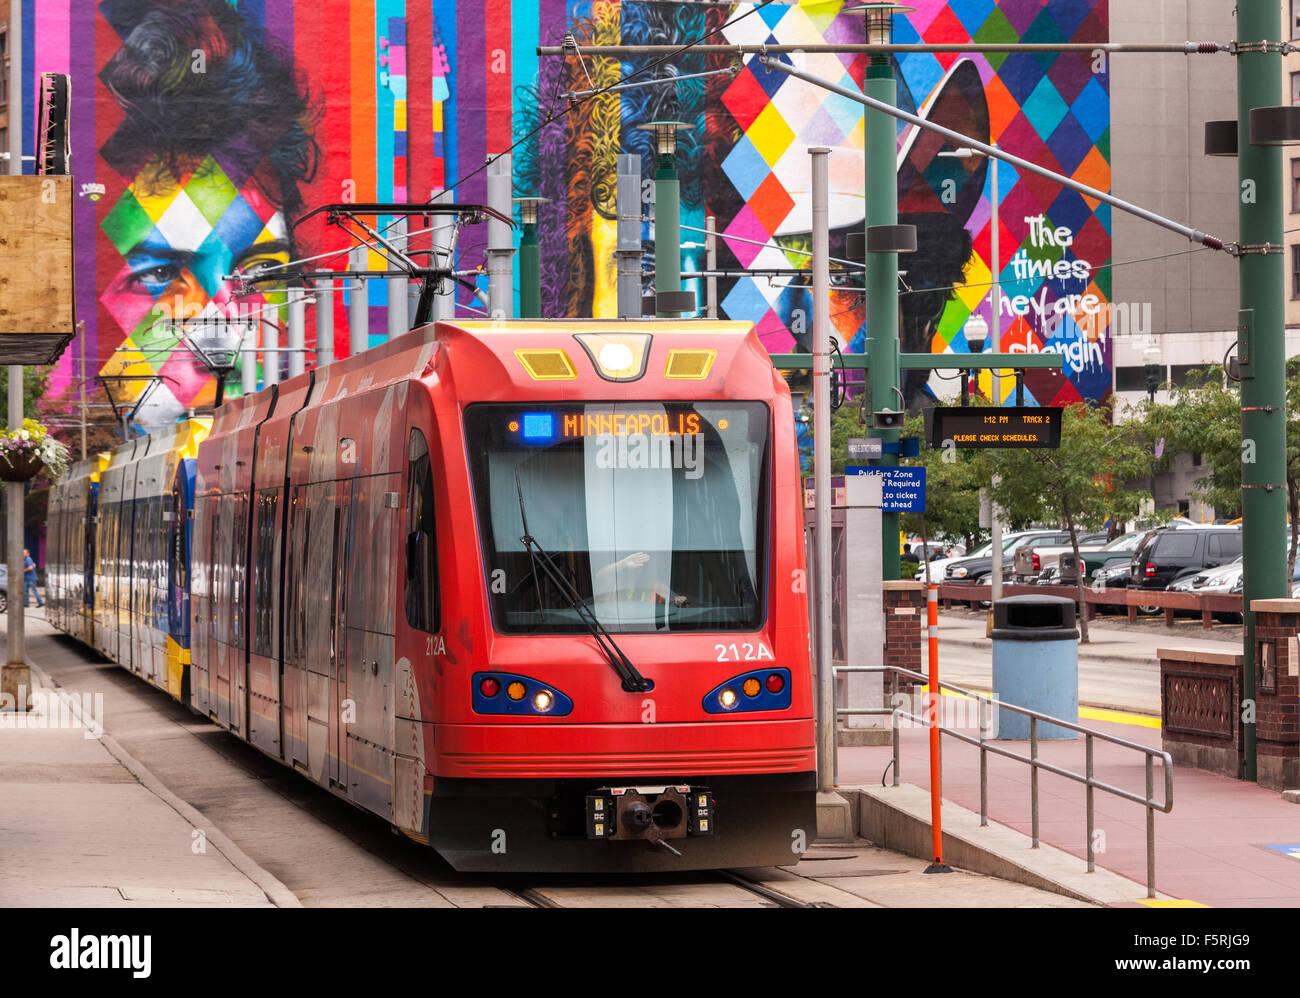 downtown-minneapolis-metro-transit-blue-line-hiawatha-light-rail-at-F5RJG9.jpg